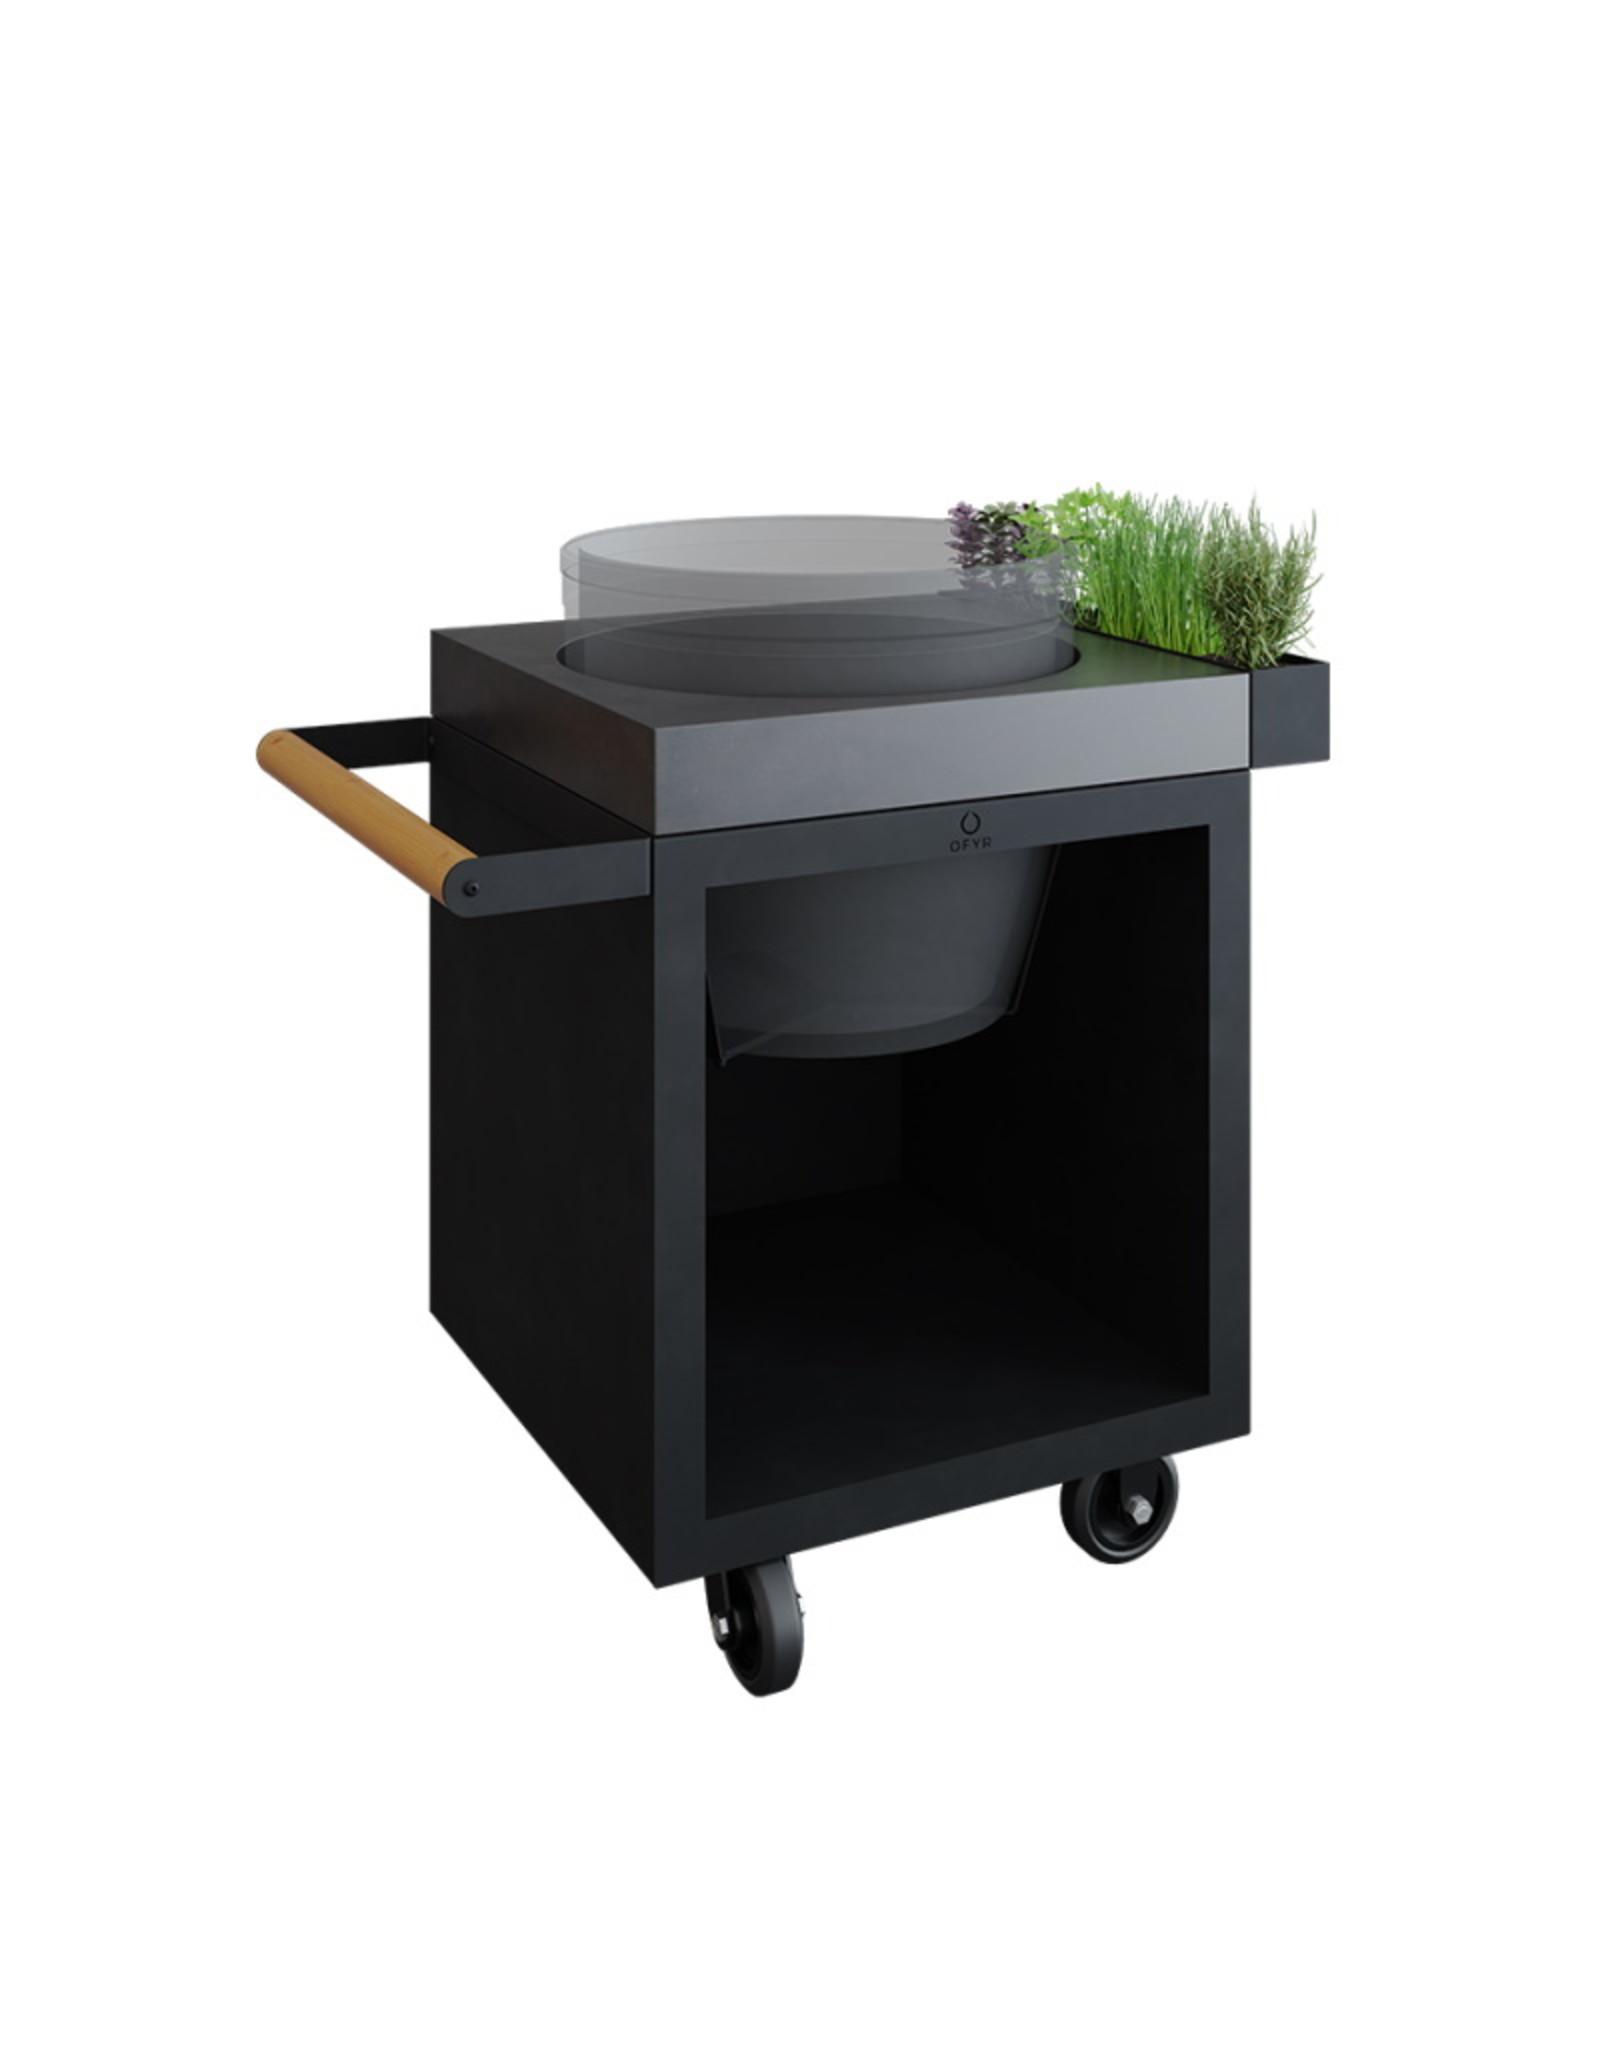 OFYR Kamado Table Black 65 PRO Concrete BGE